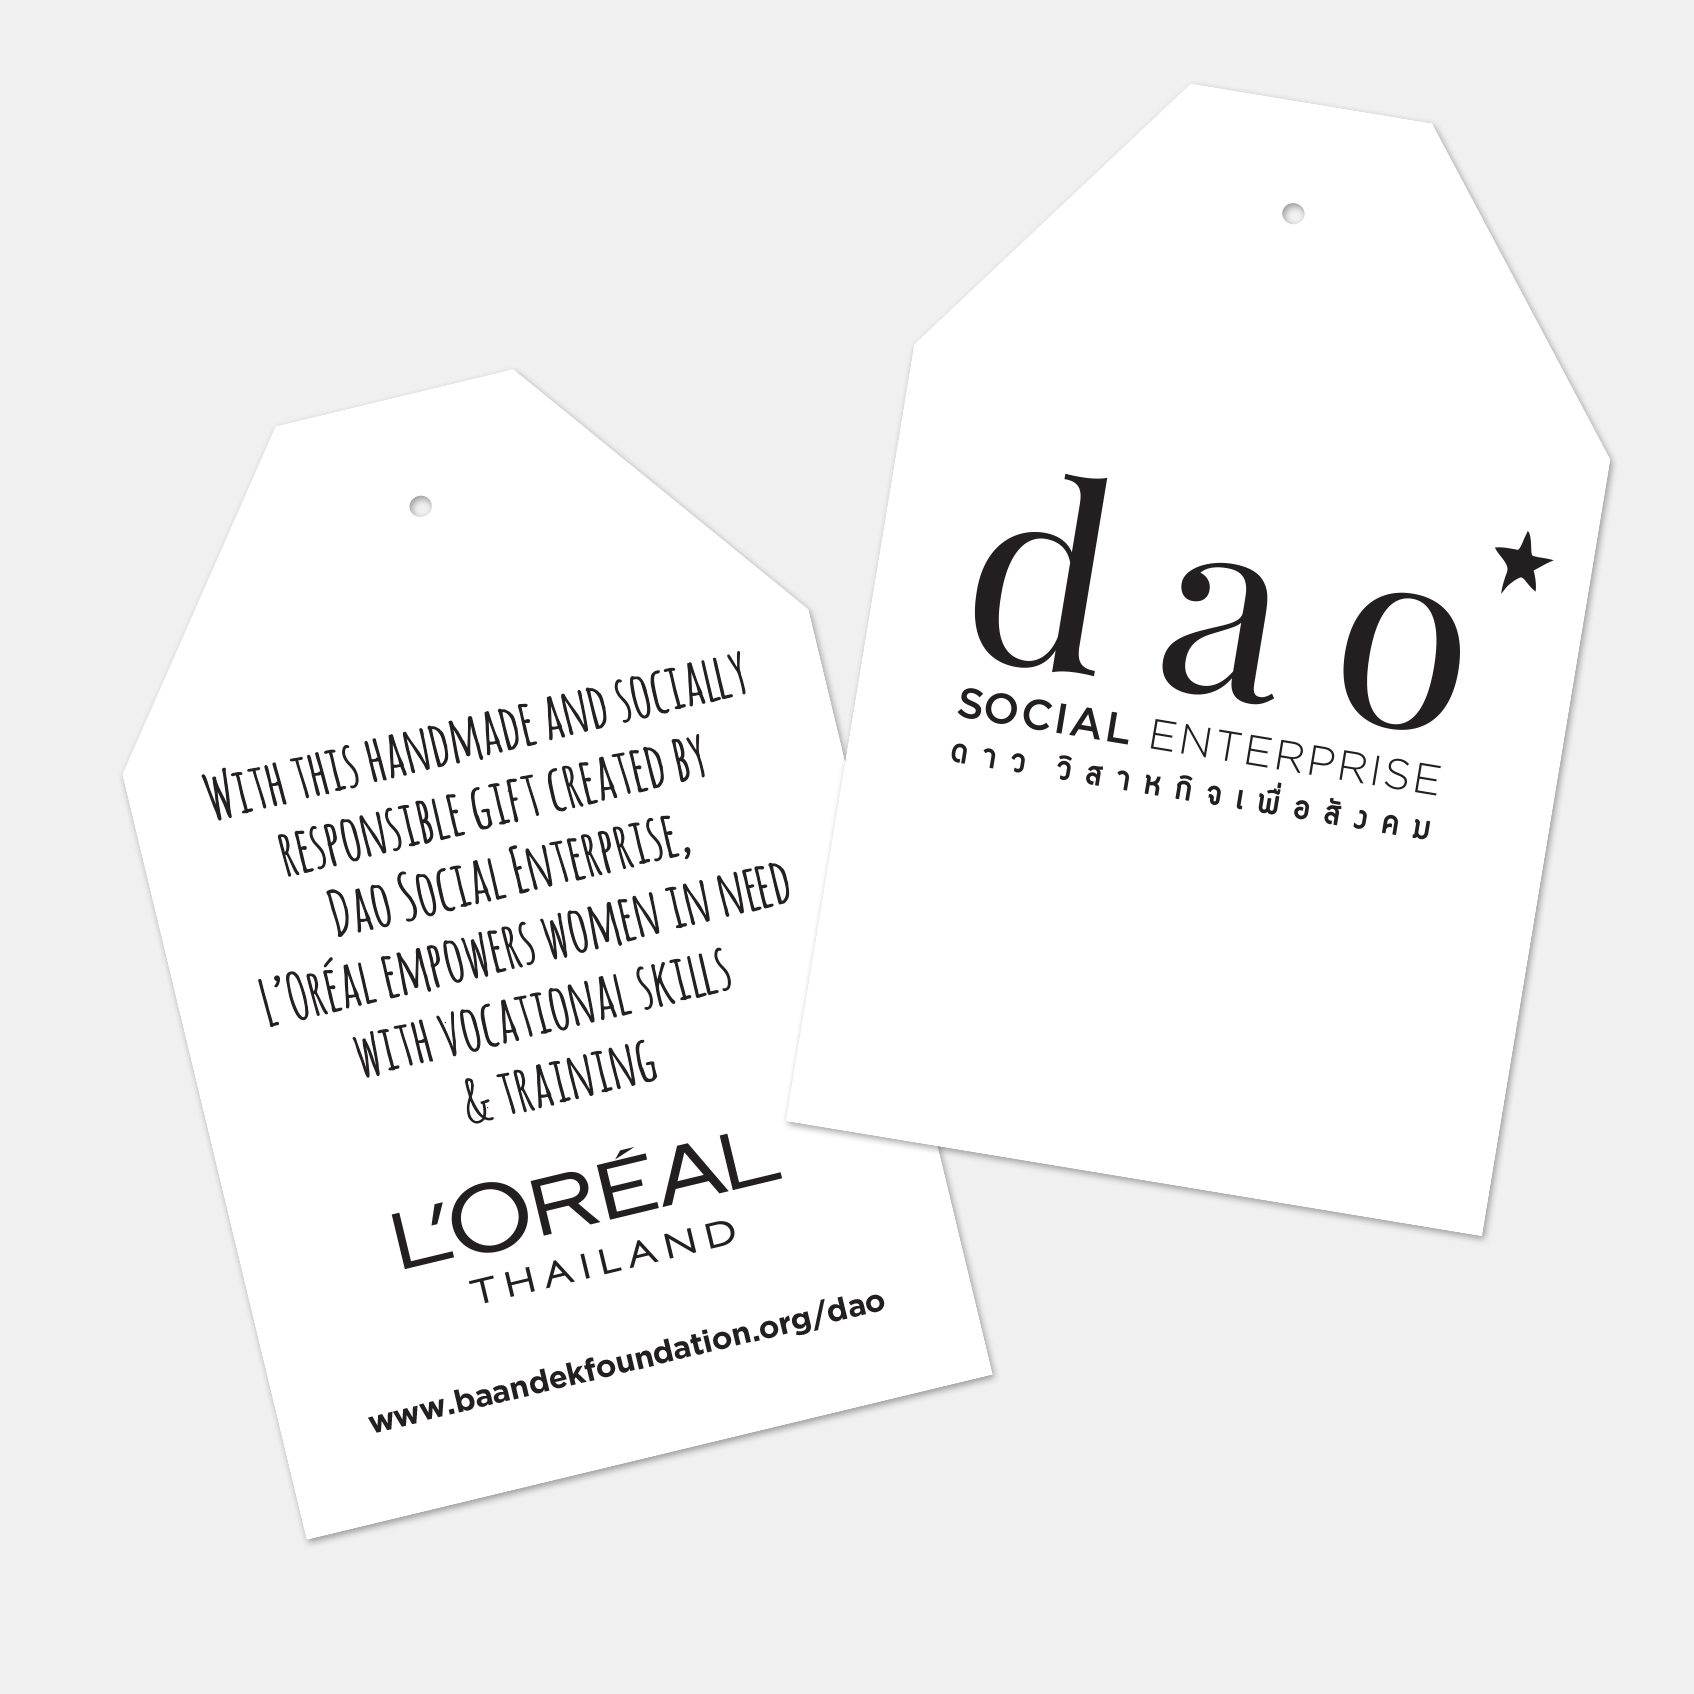 08_Label_L'Oreal_s.jpg